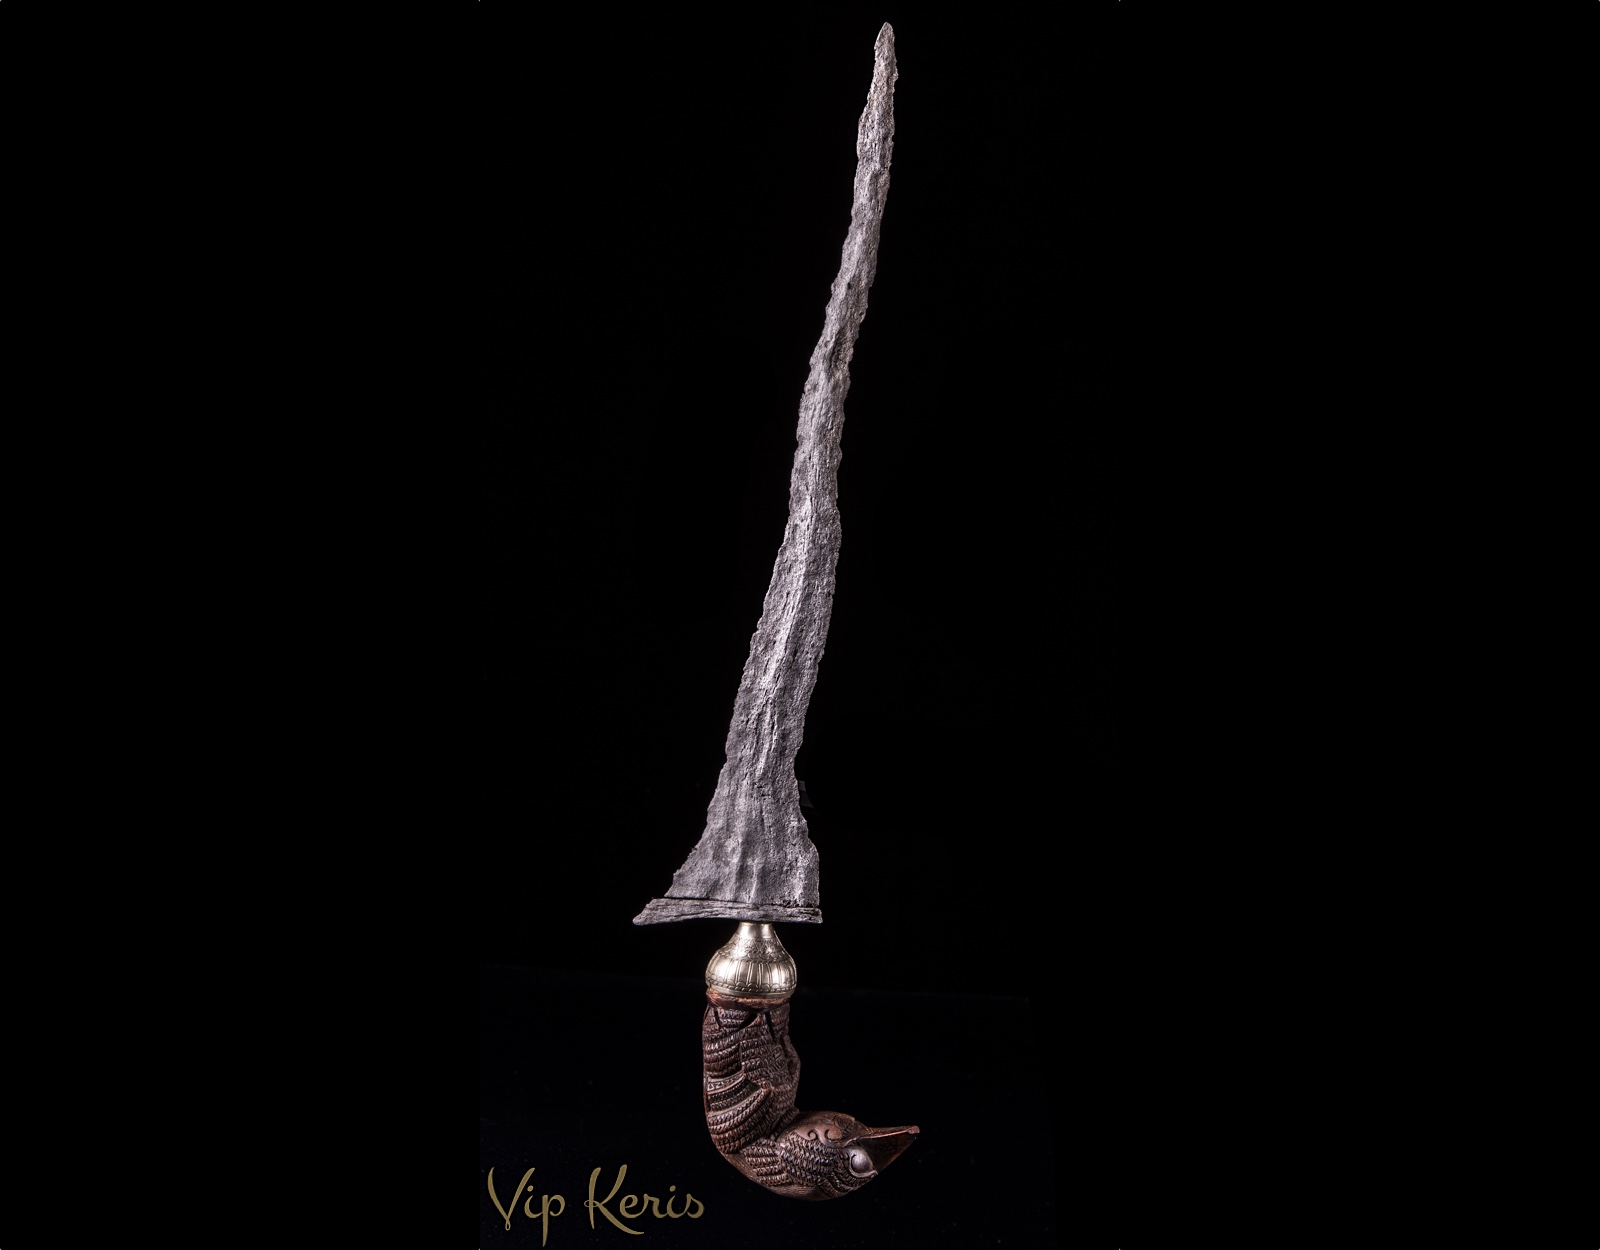 Кинжал Крис Dholog, стихия Жизнь фото VipKeris